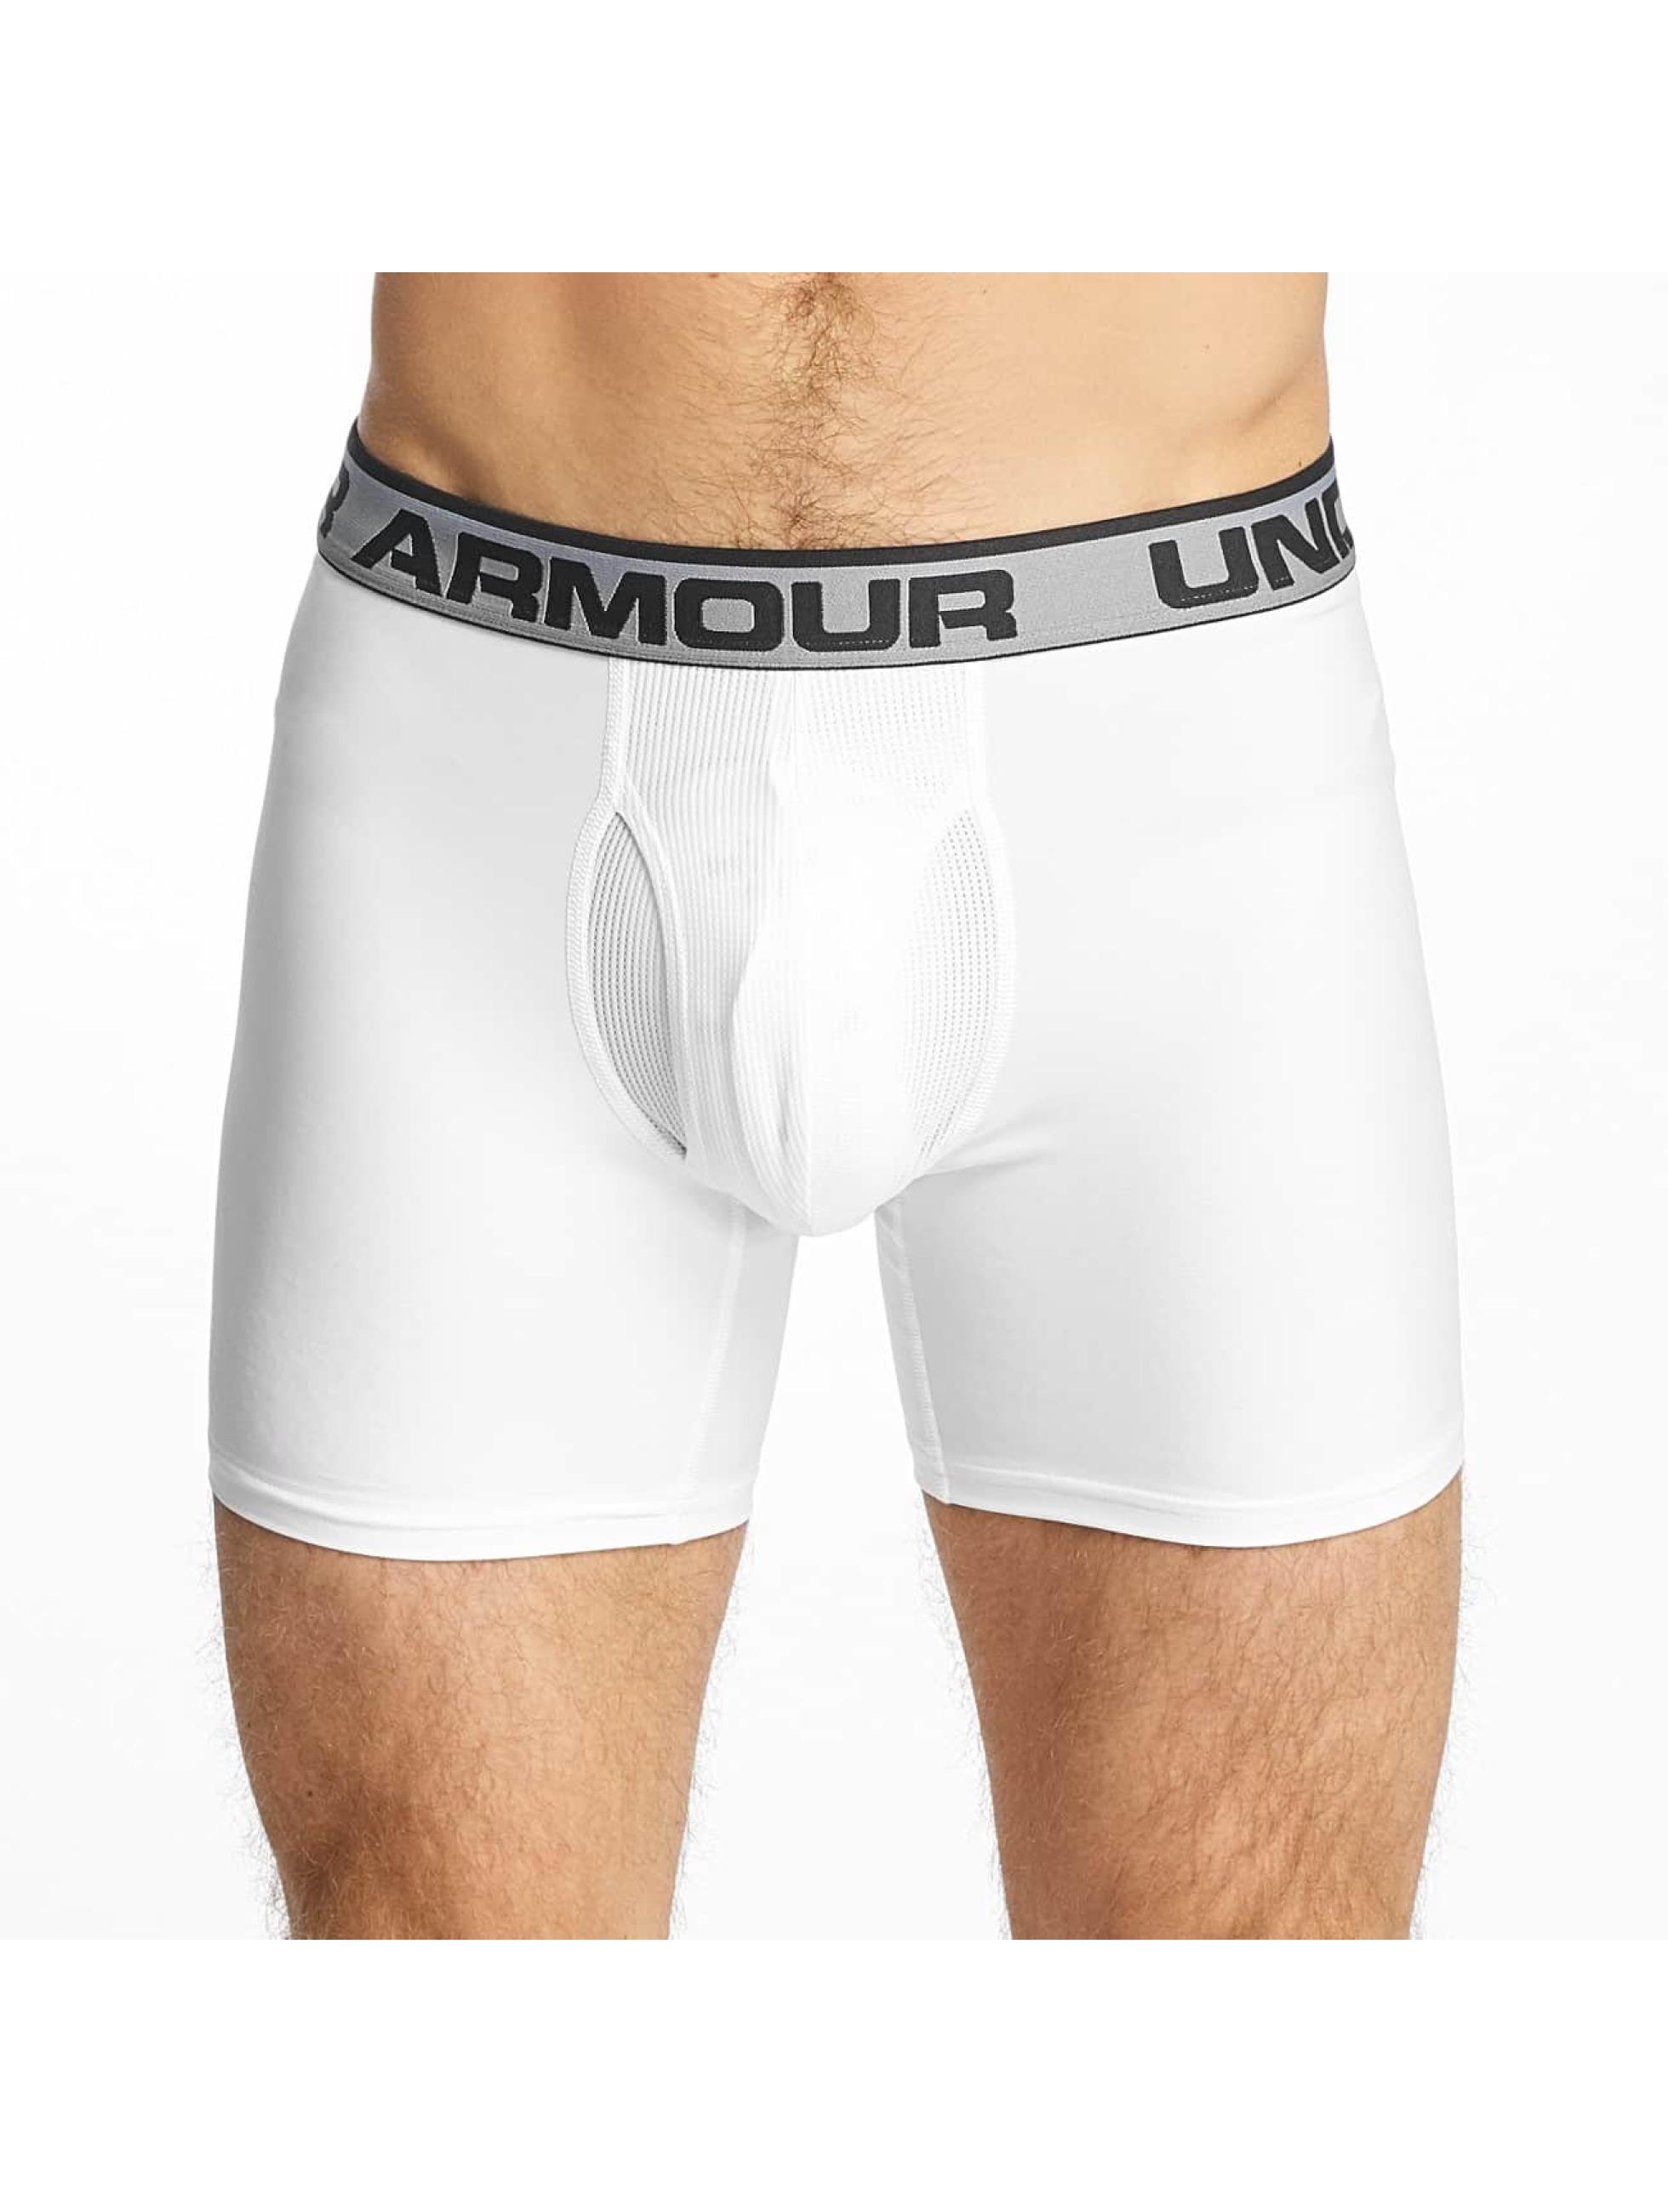 Under Armour Boxer Short The Original 6'' white